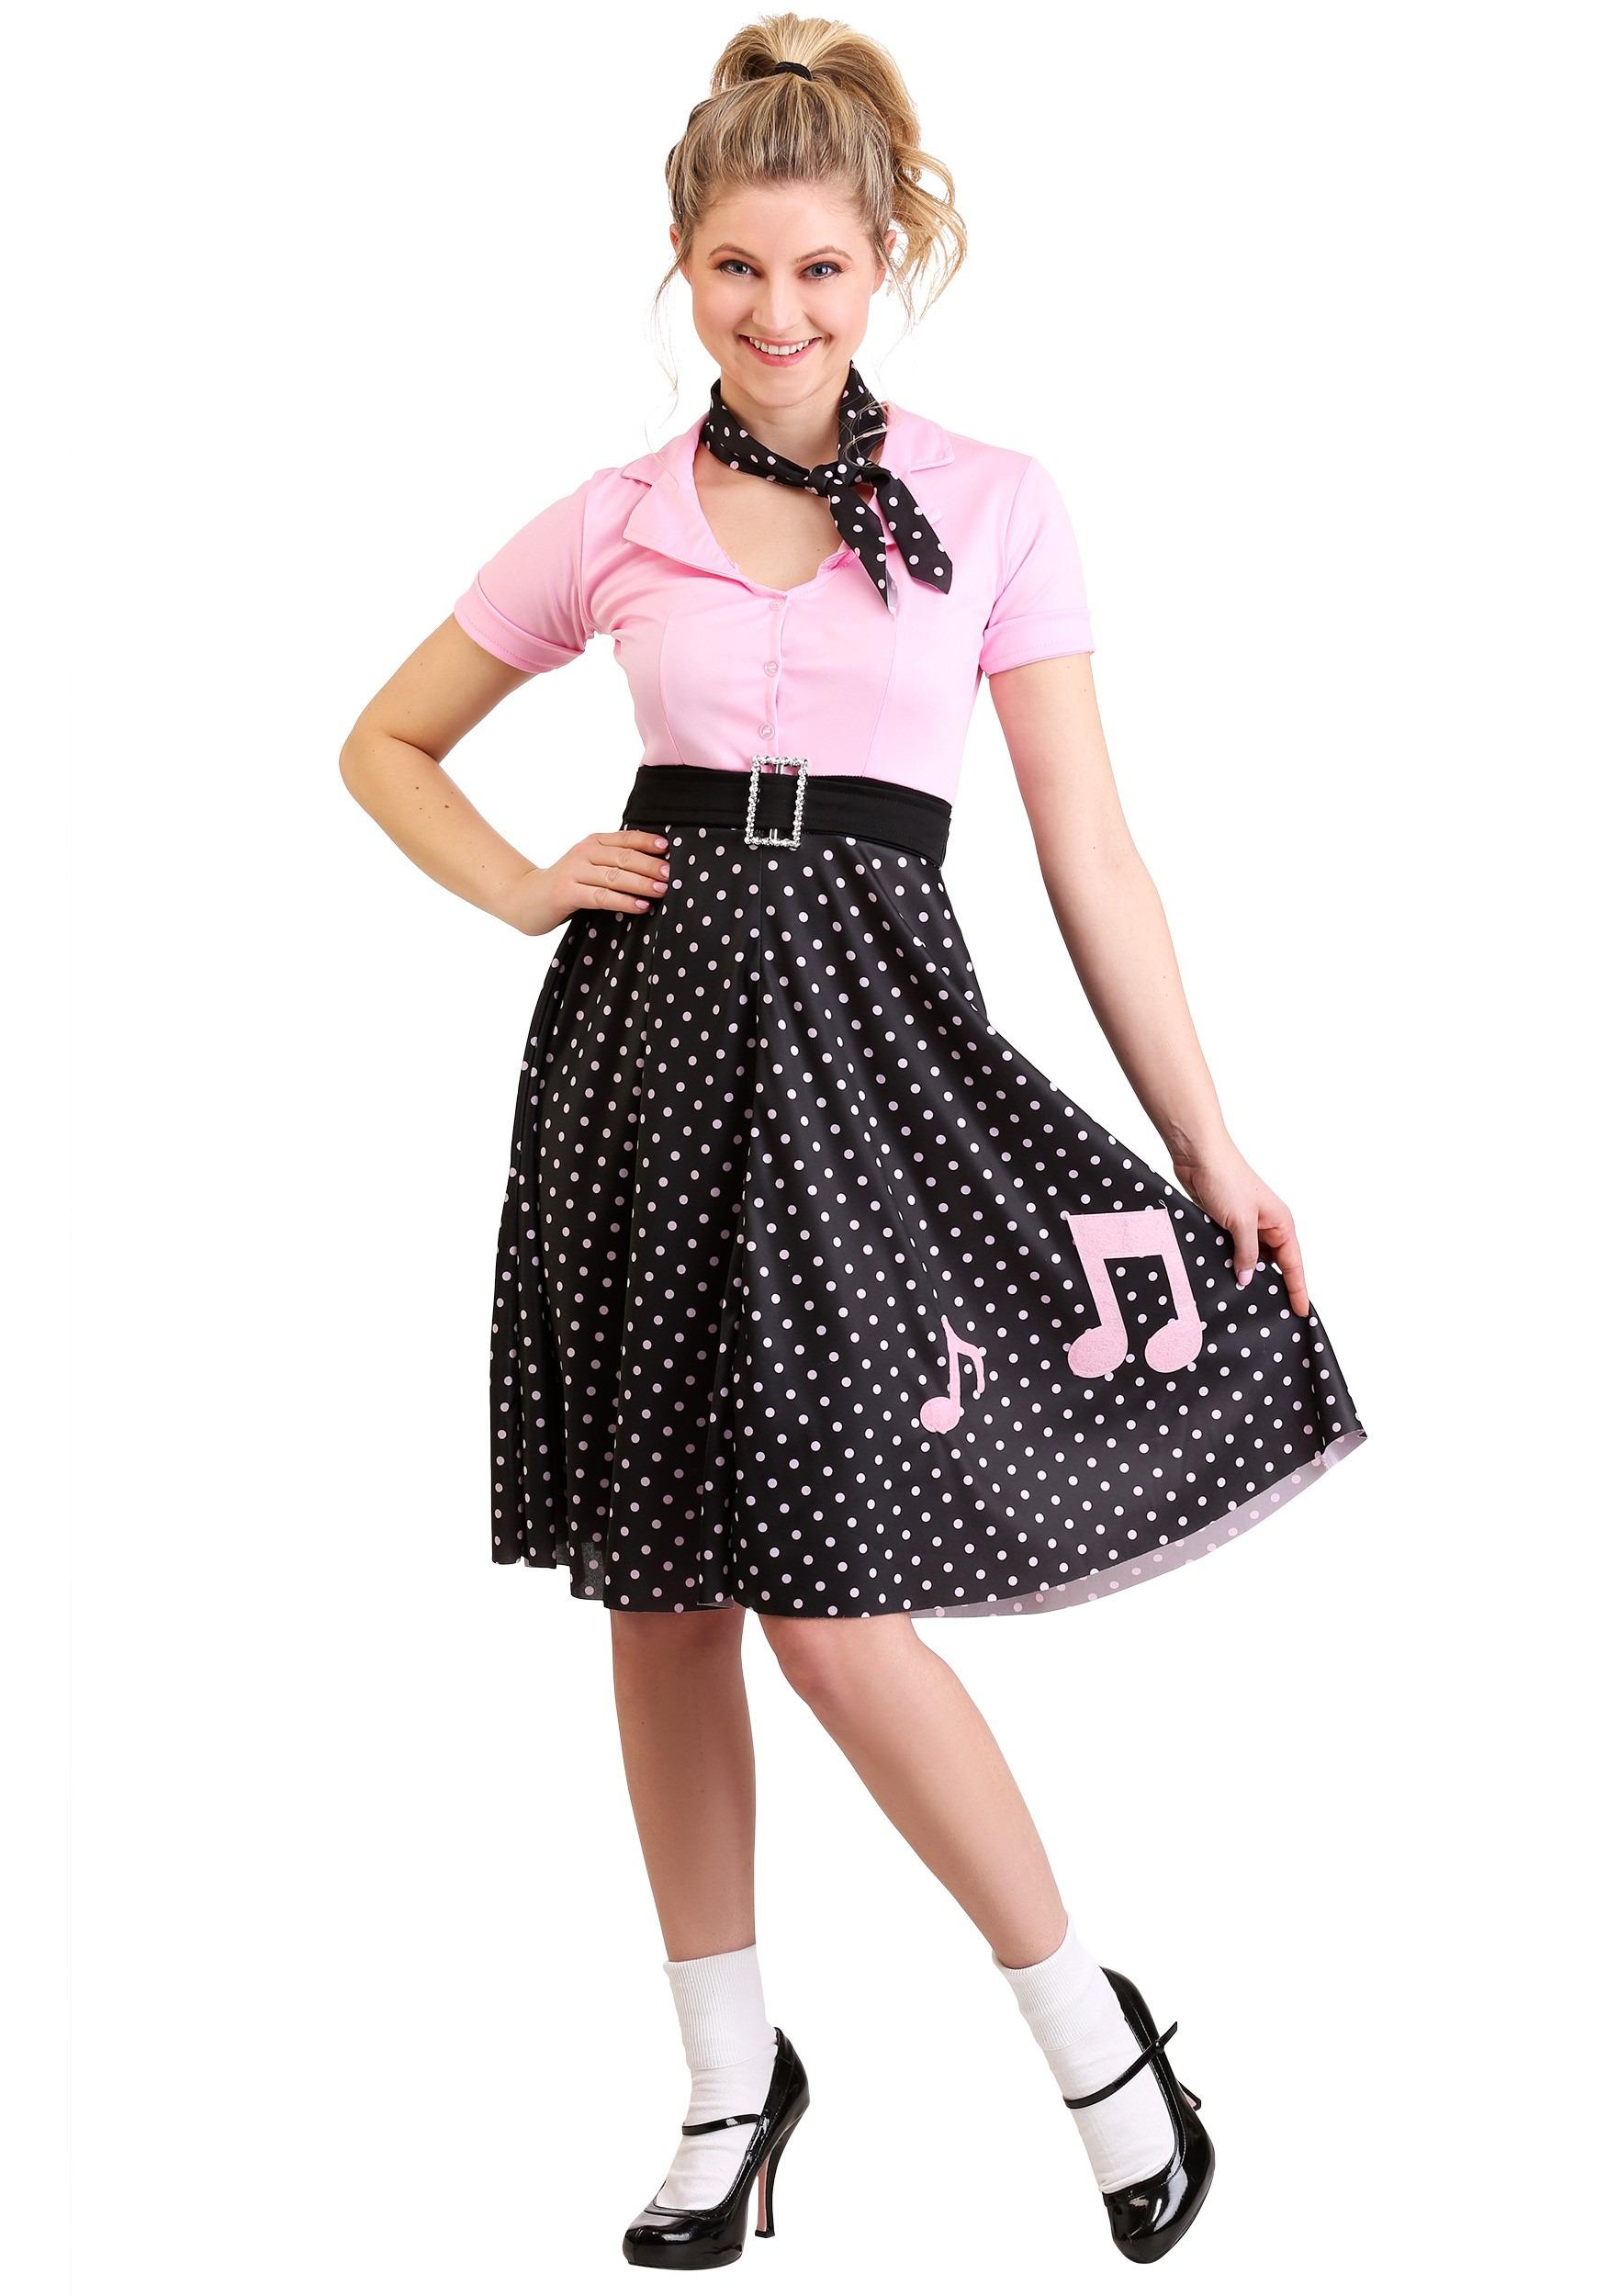 Women's Sock Hop Cutie Costume